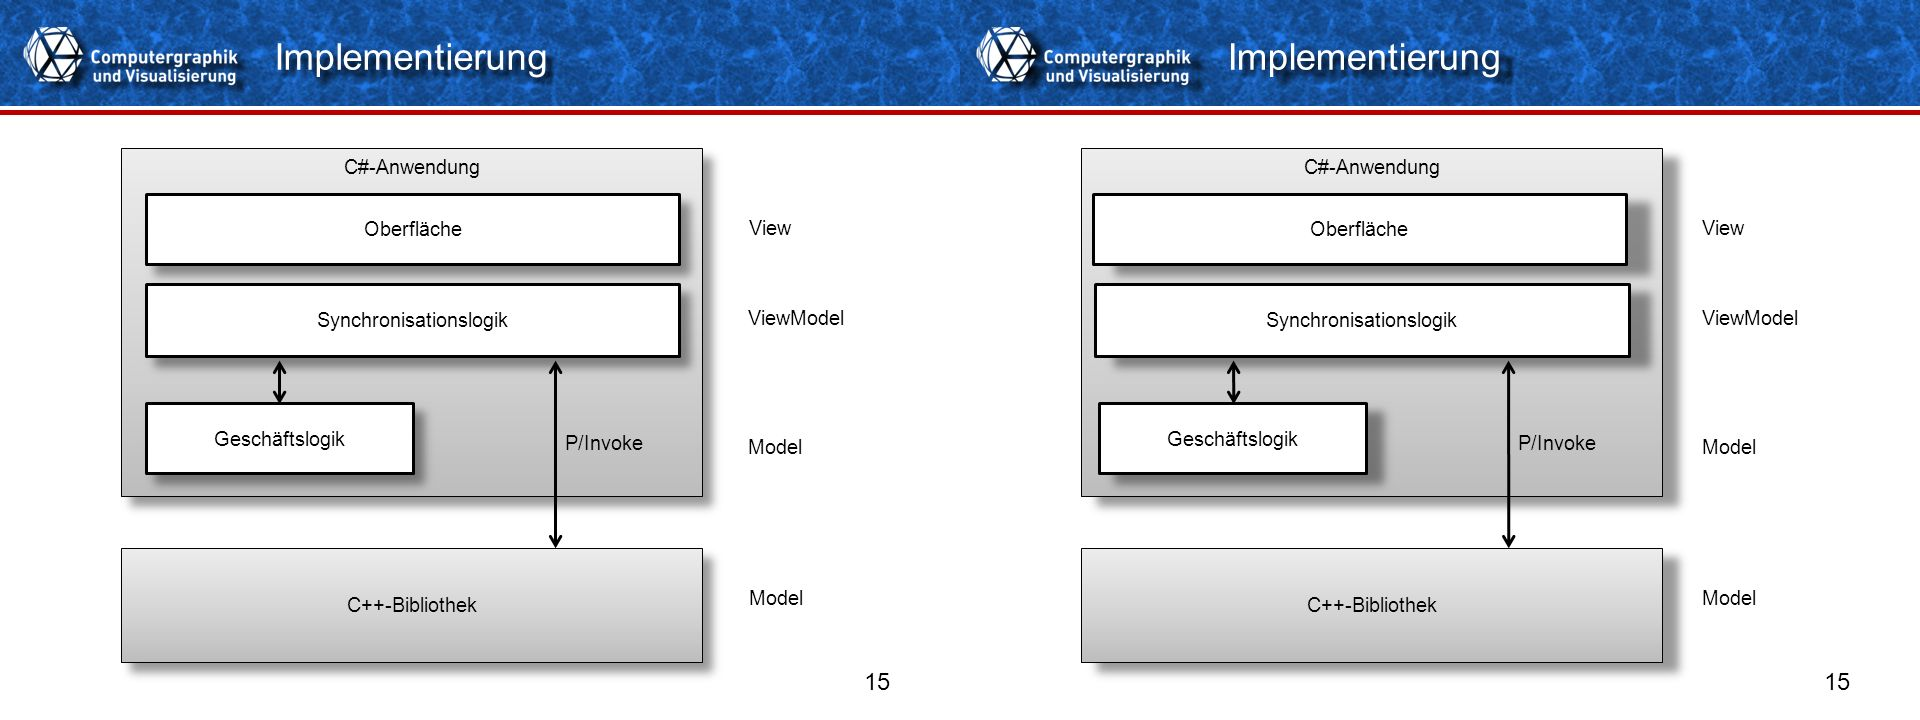 Implementierung Implementierung C#-Anwendung C#-Anwendung Oberfläche